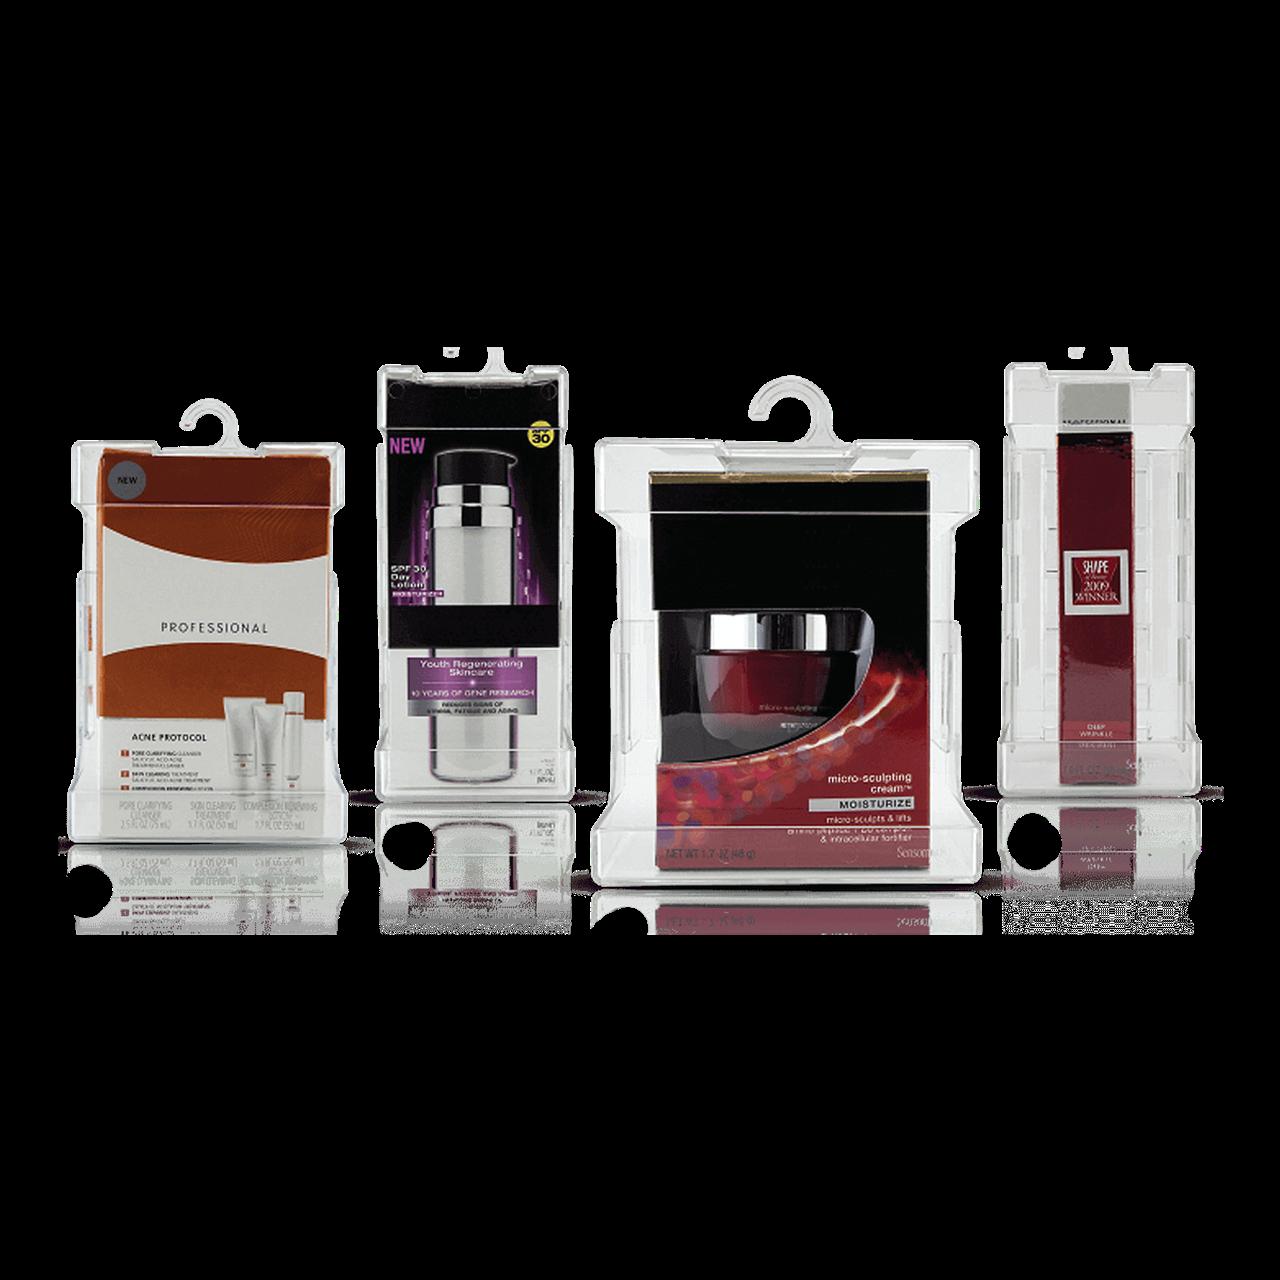 Sensormatic Adjustable Multi-Purpose Safers in Armenia Vantag LLC